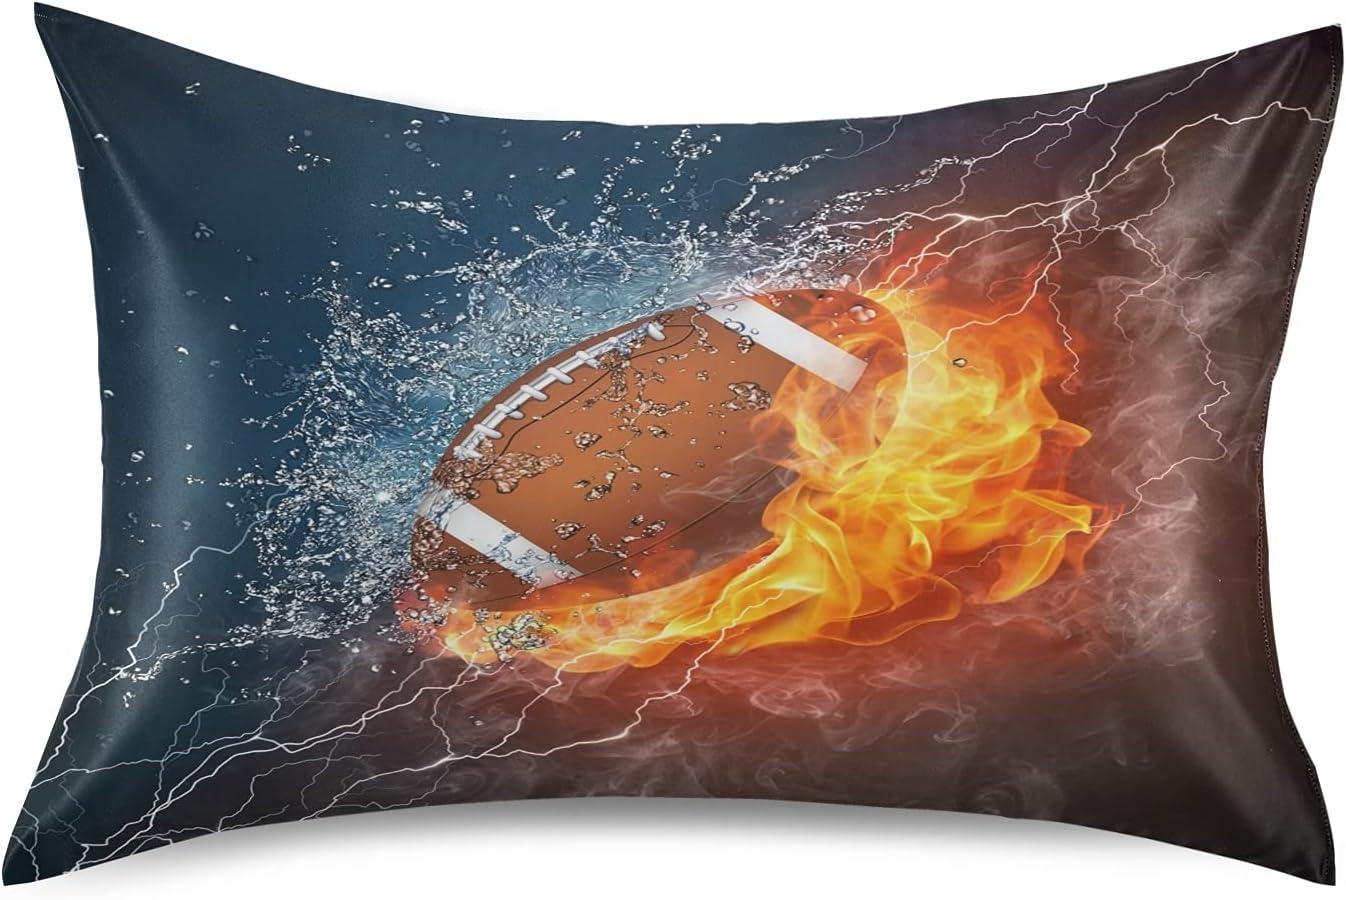 Art Ice Fire New item Rugby Football Pillowcase Pillow Cover Sham Qu Japan's largest assortment Case